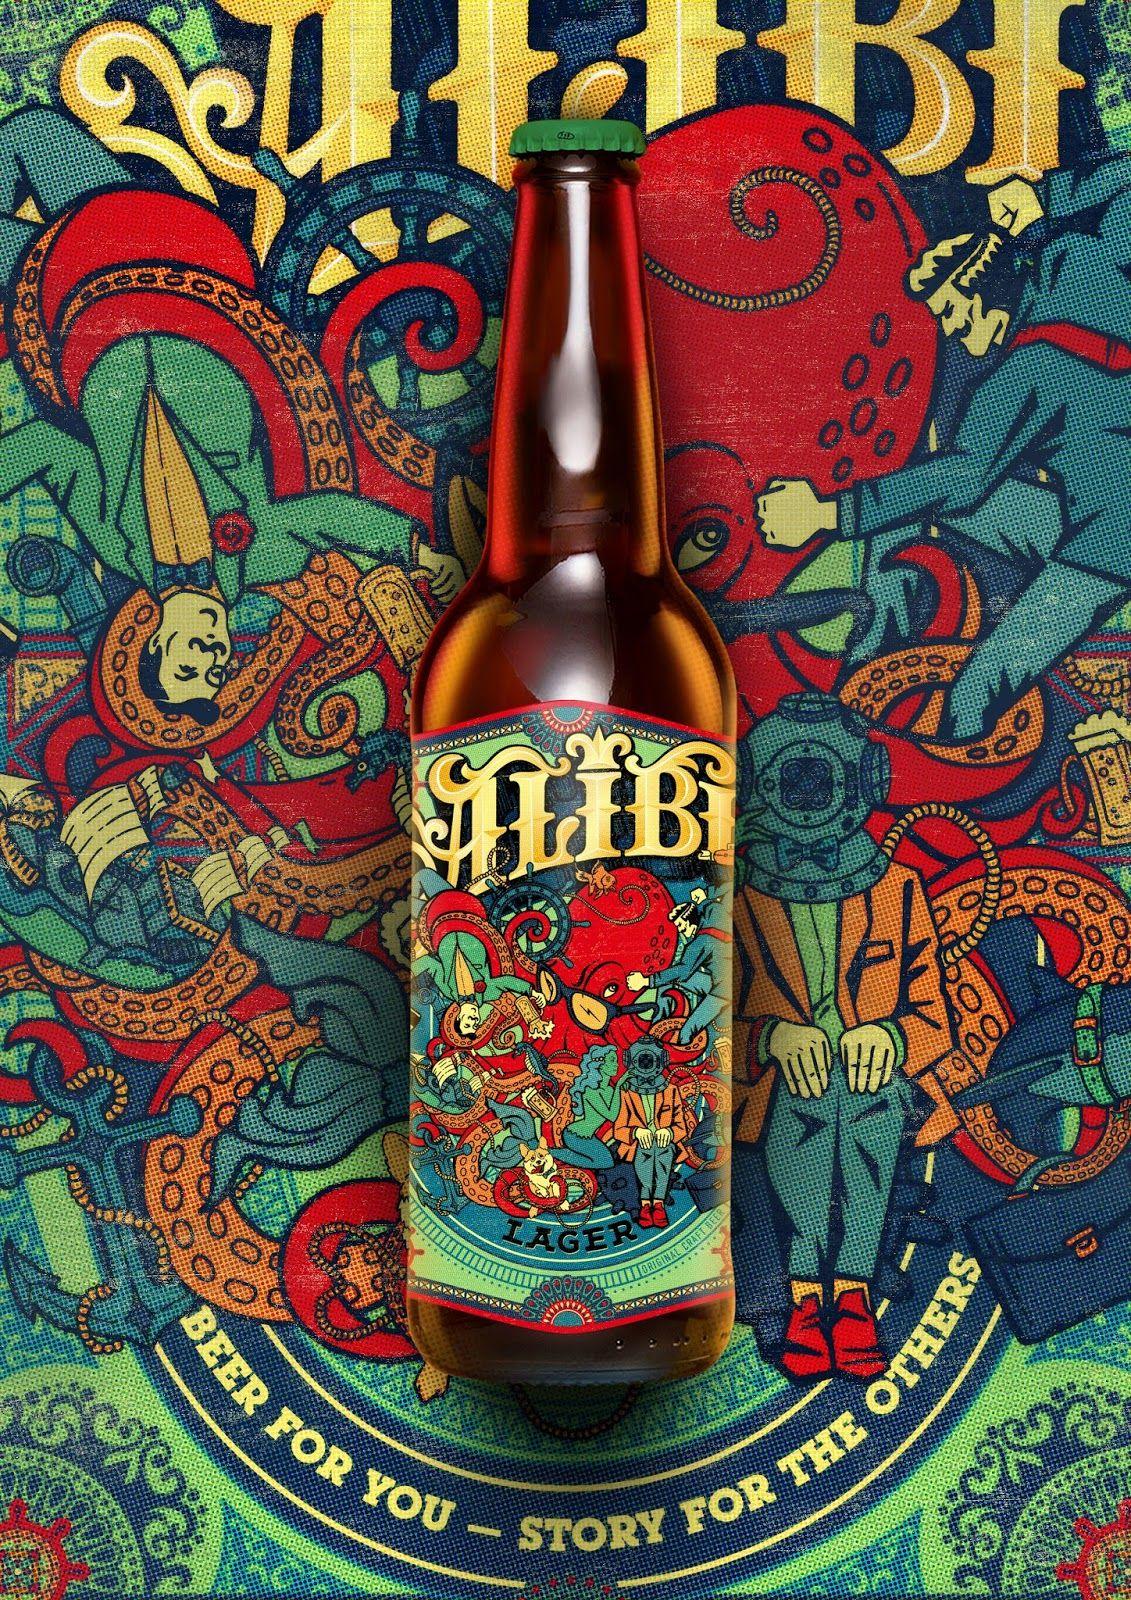 Alibi On Packaging Of The World Creative Package Design Gallery Beer Bottle Design Craft Beer Design Craft Beer Packaging